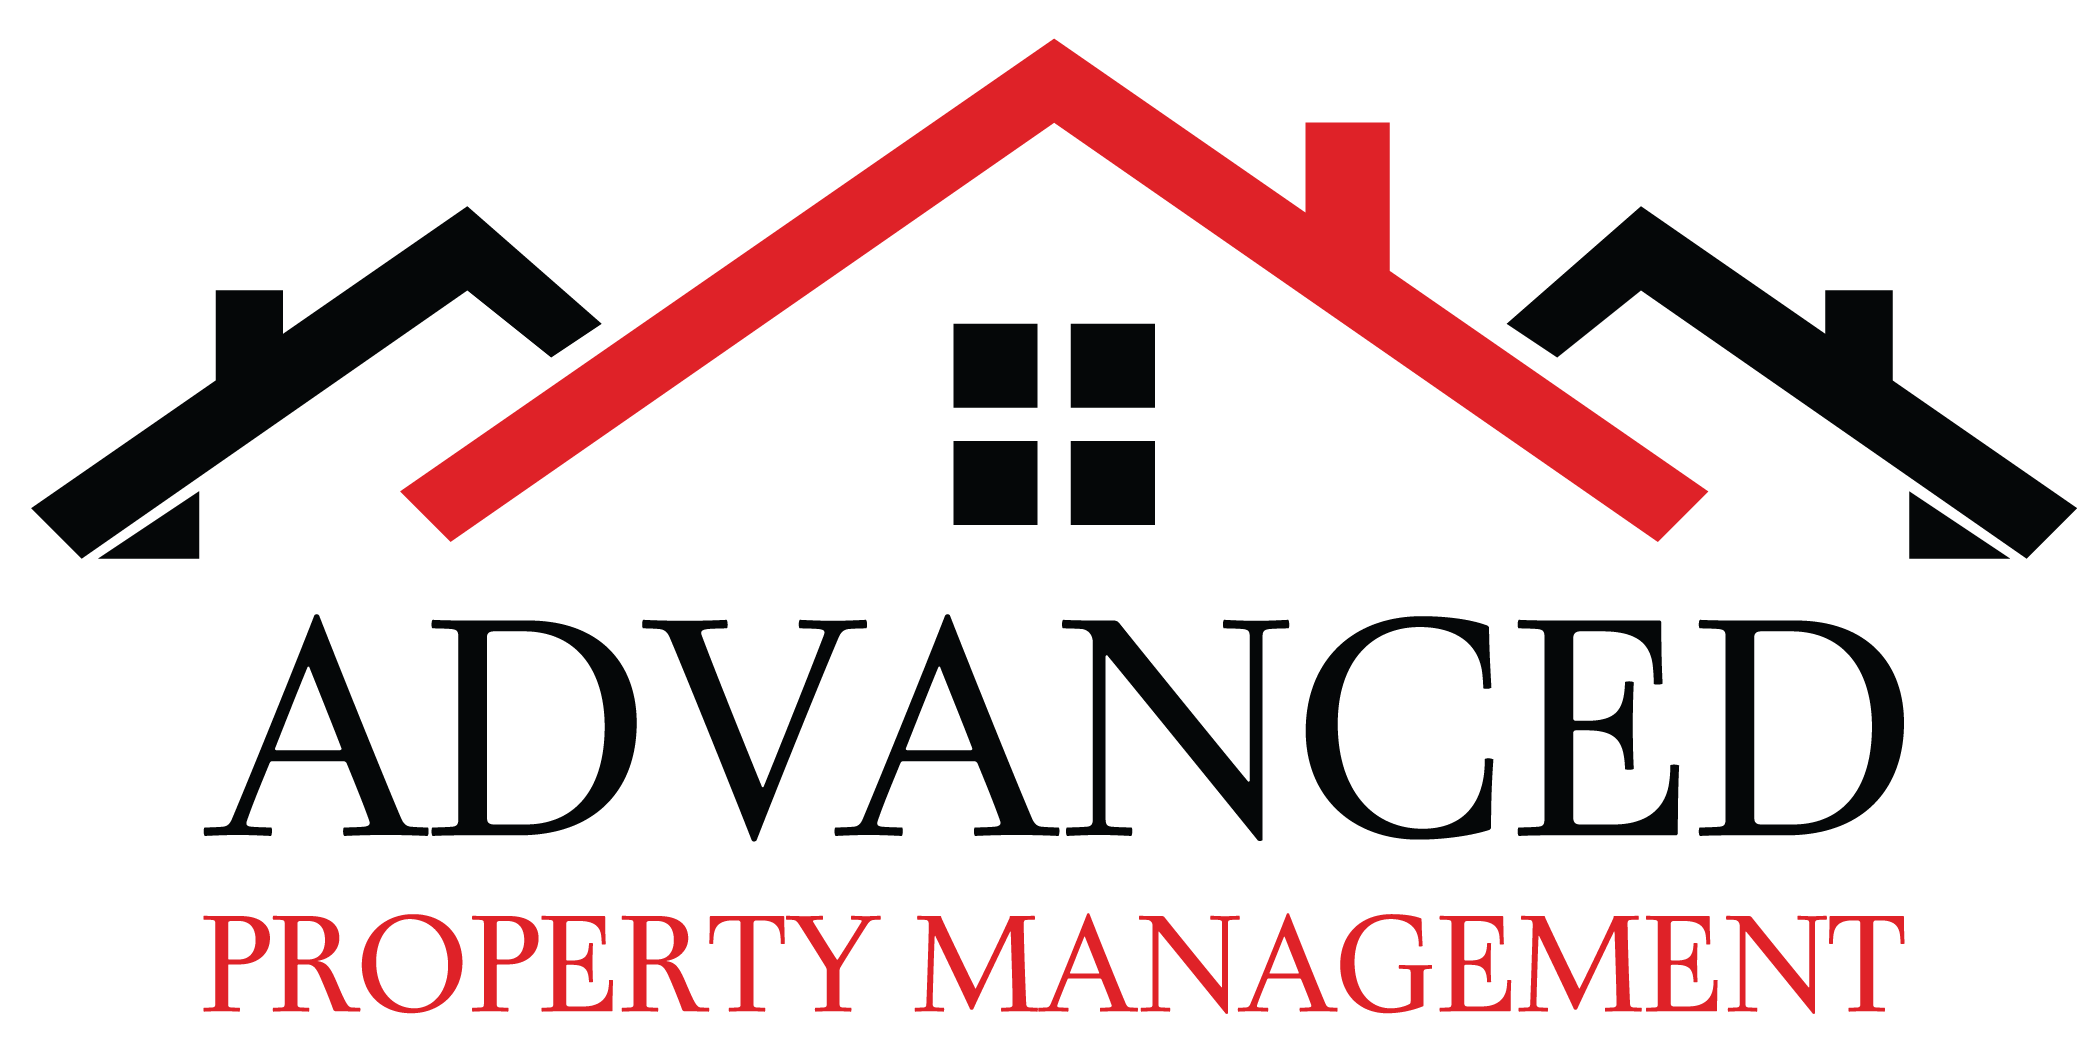 property management logos rh logolynx com property management logos free property management logo inspiration